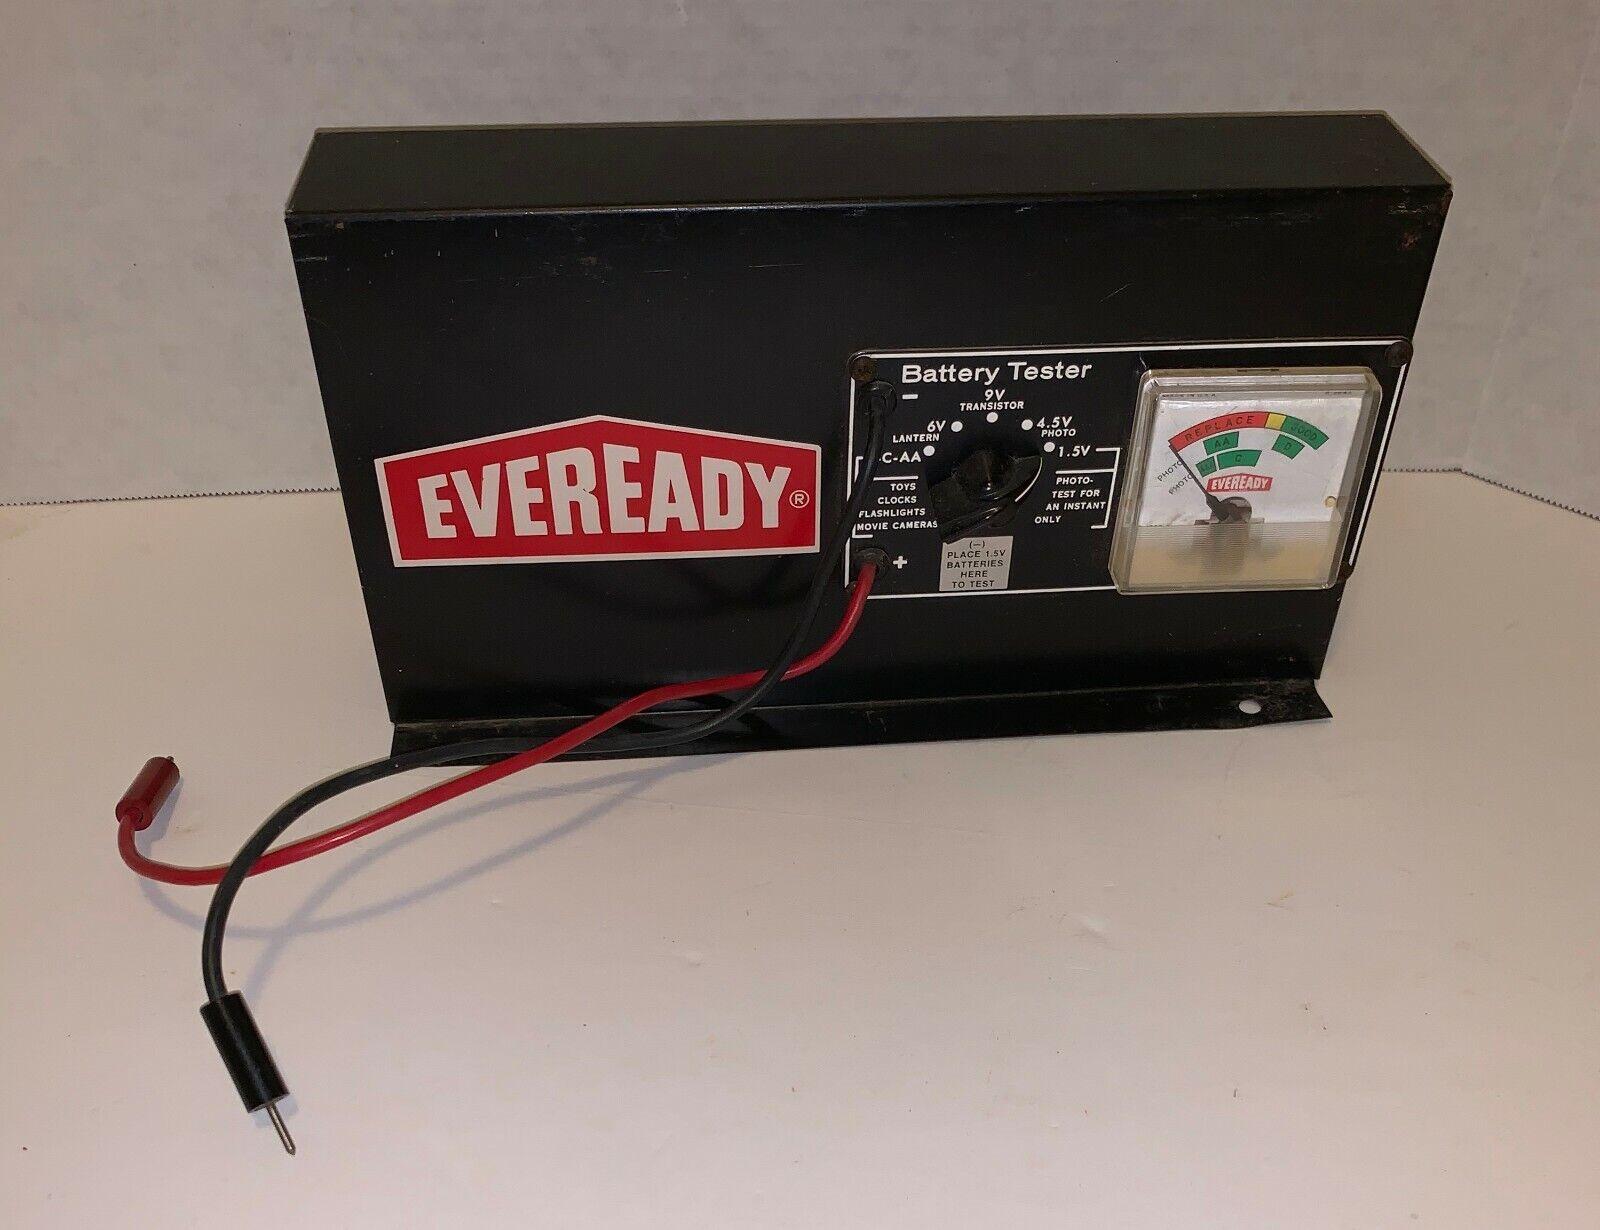 Vintage Eveready Battery Tester - Works 6V, 9V, 4.5V, 1.5V - 11